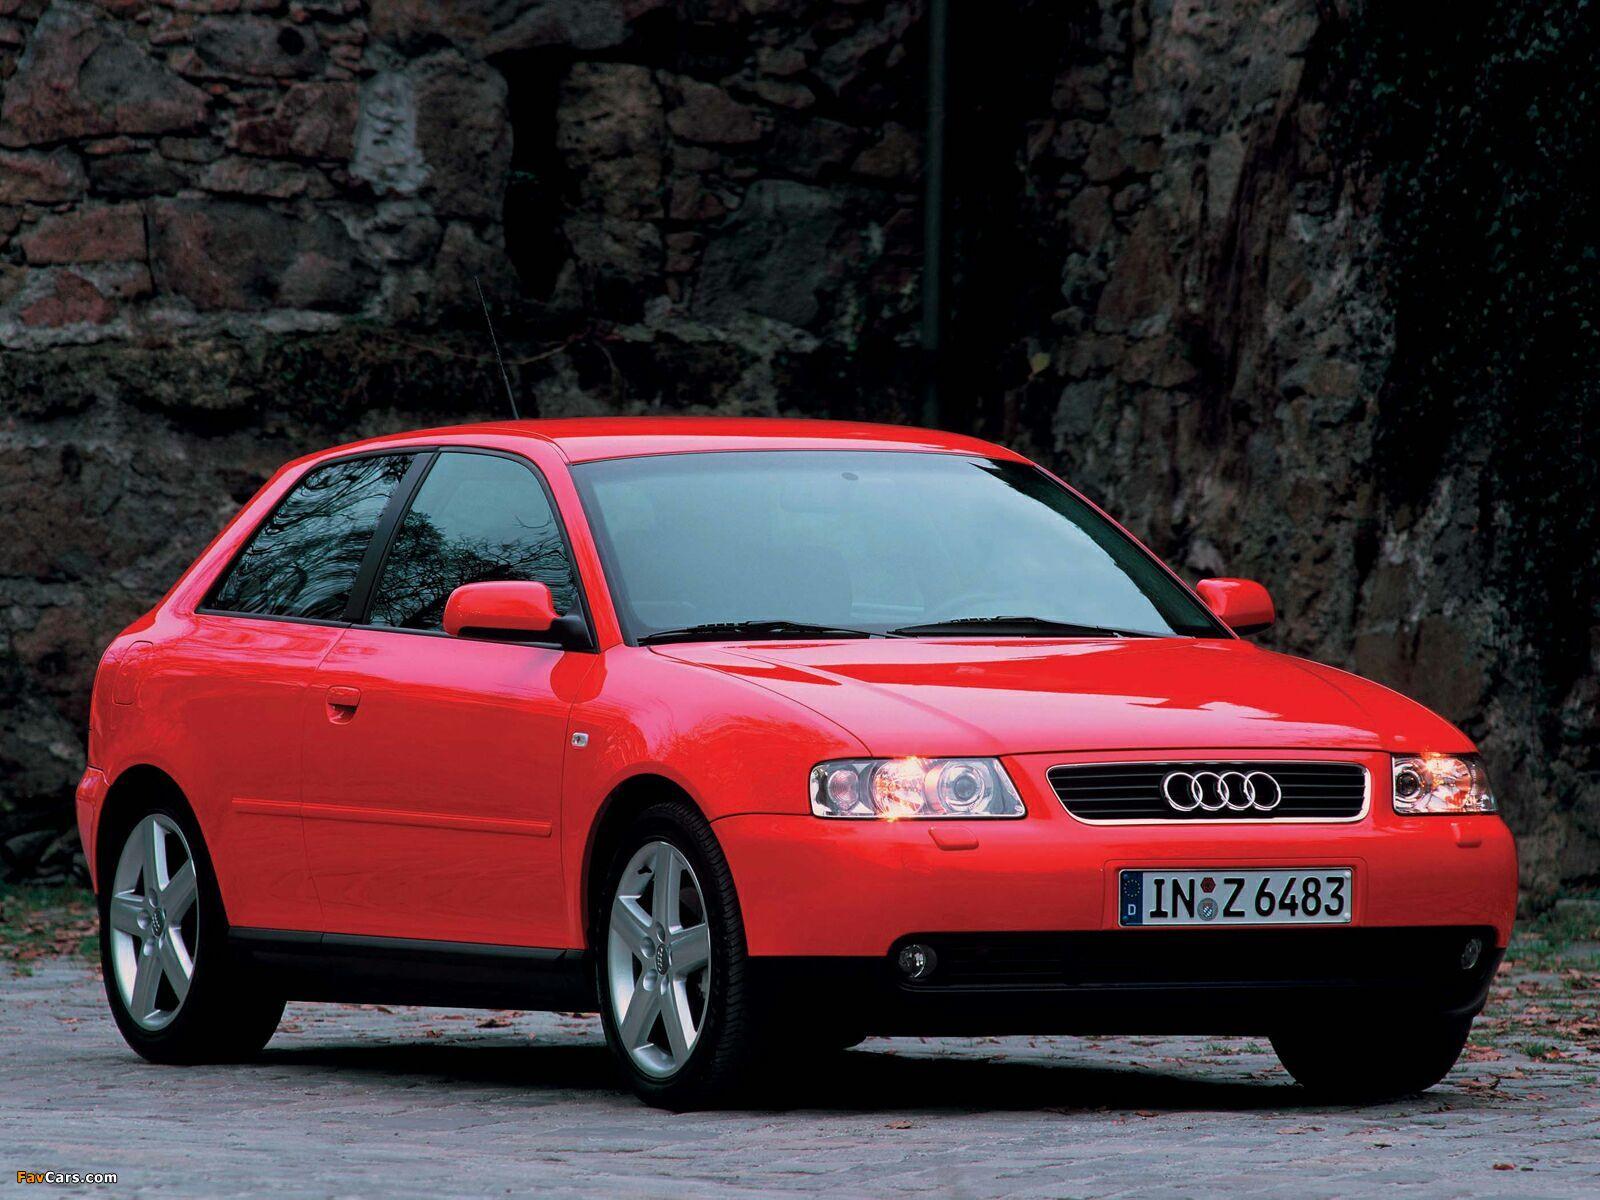 Images Of Audi A3 8l 1996 2000 1600x1200